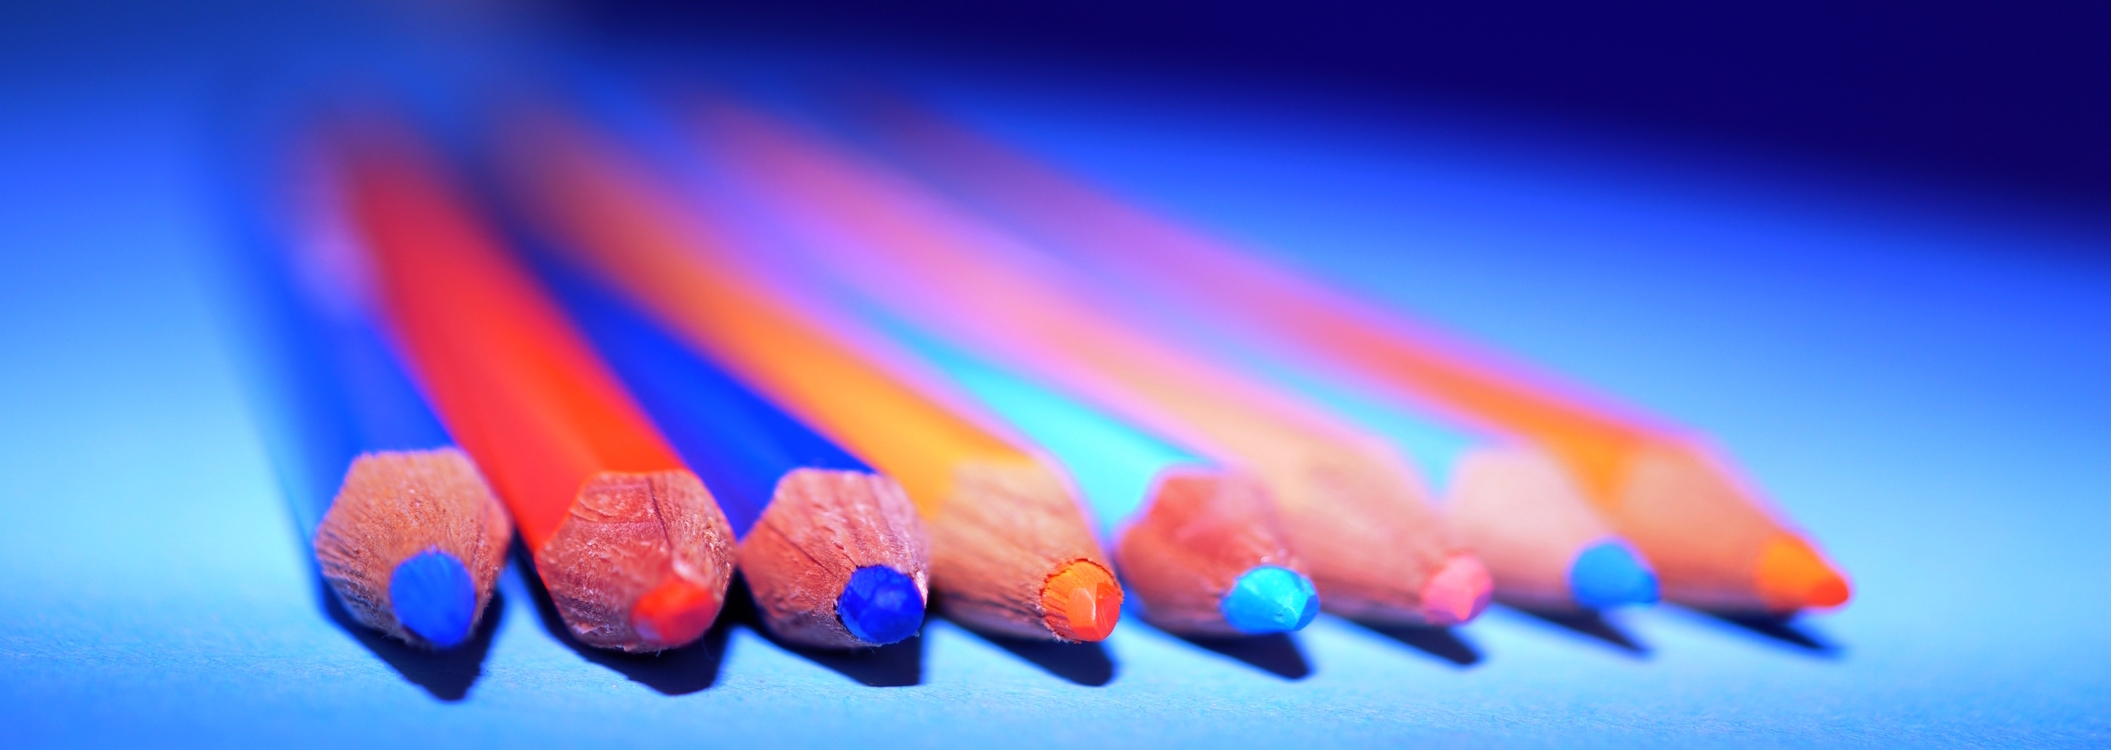 Blue,Pencil,Close Up